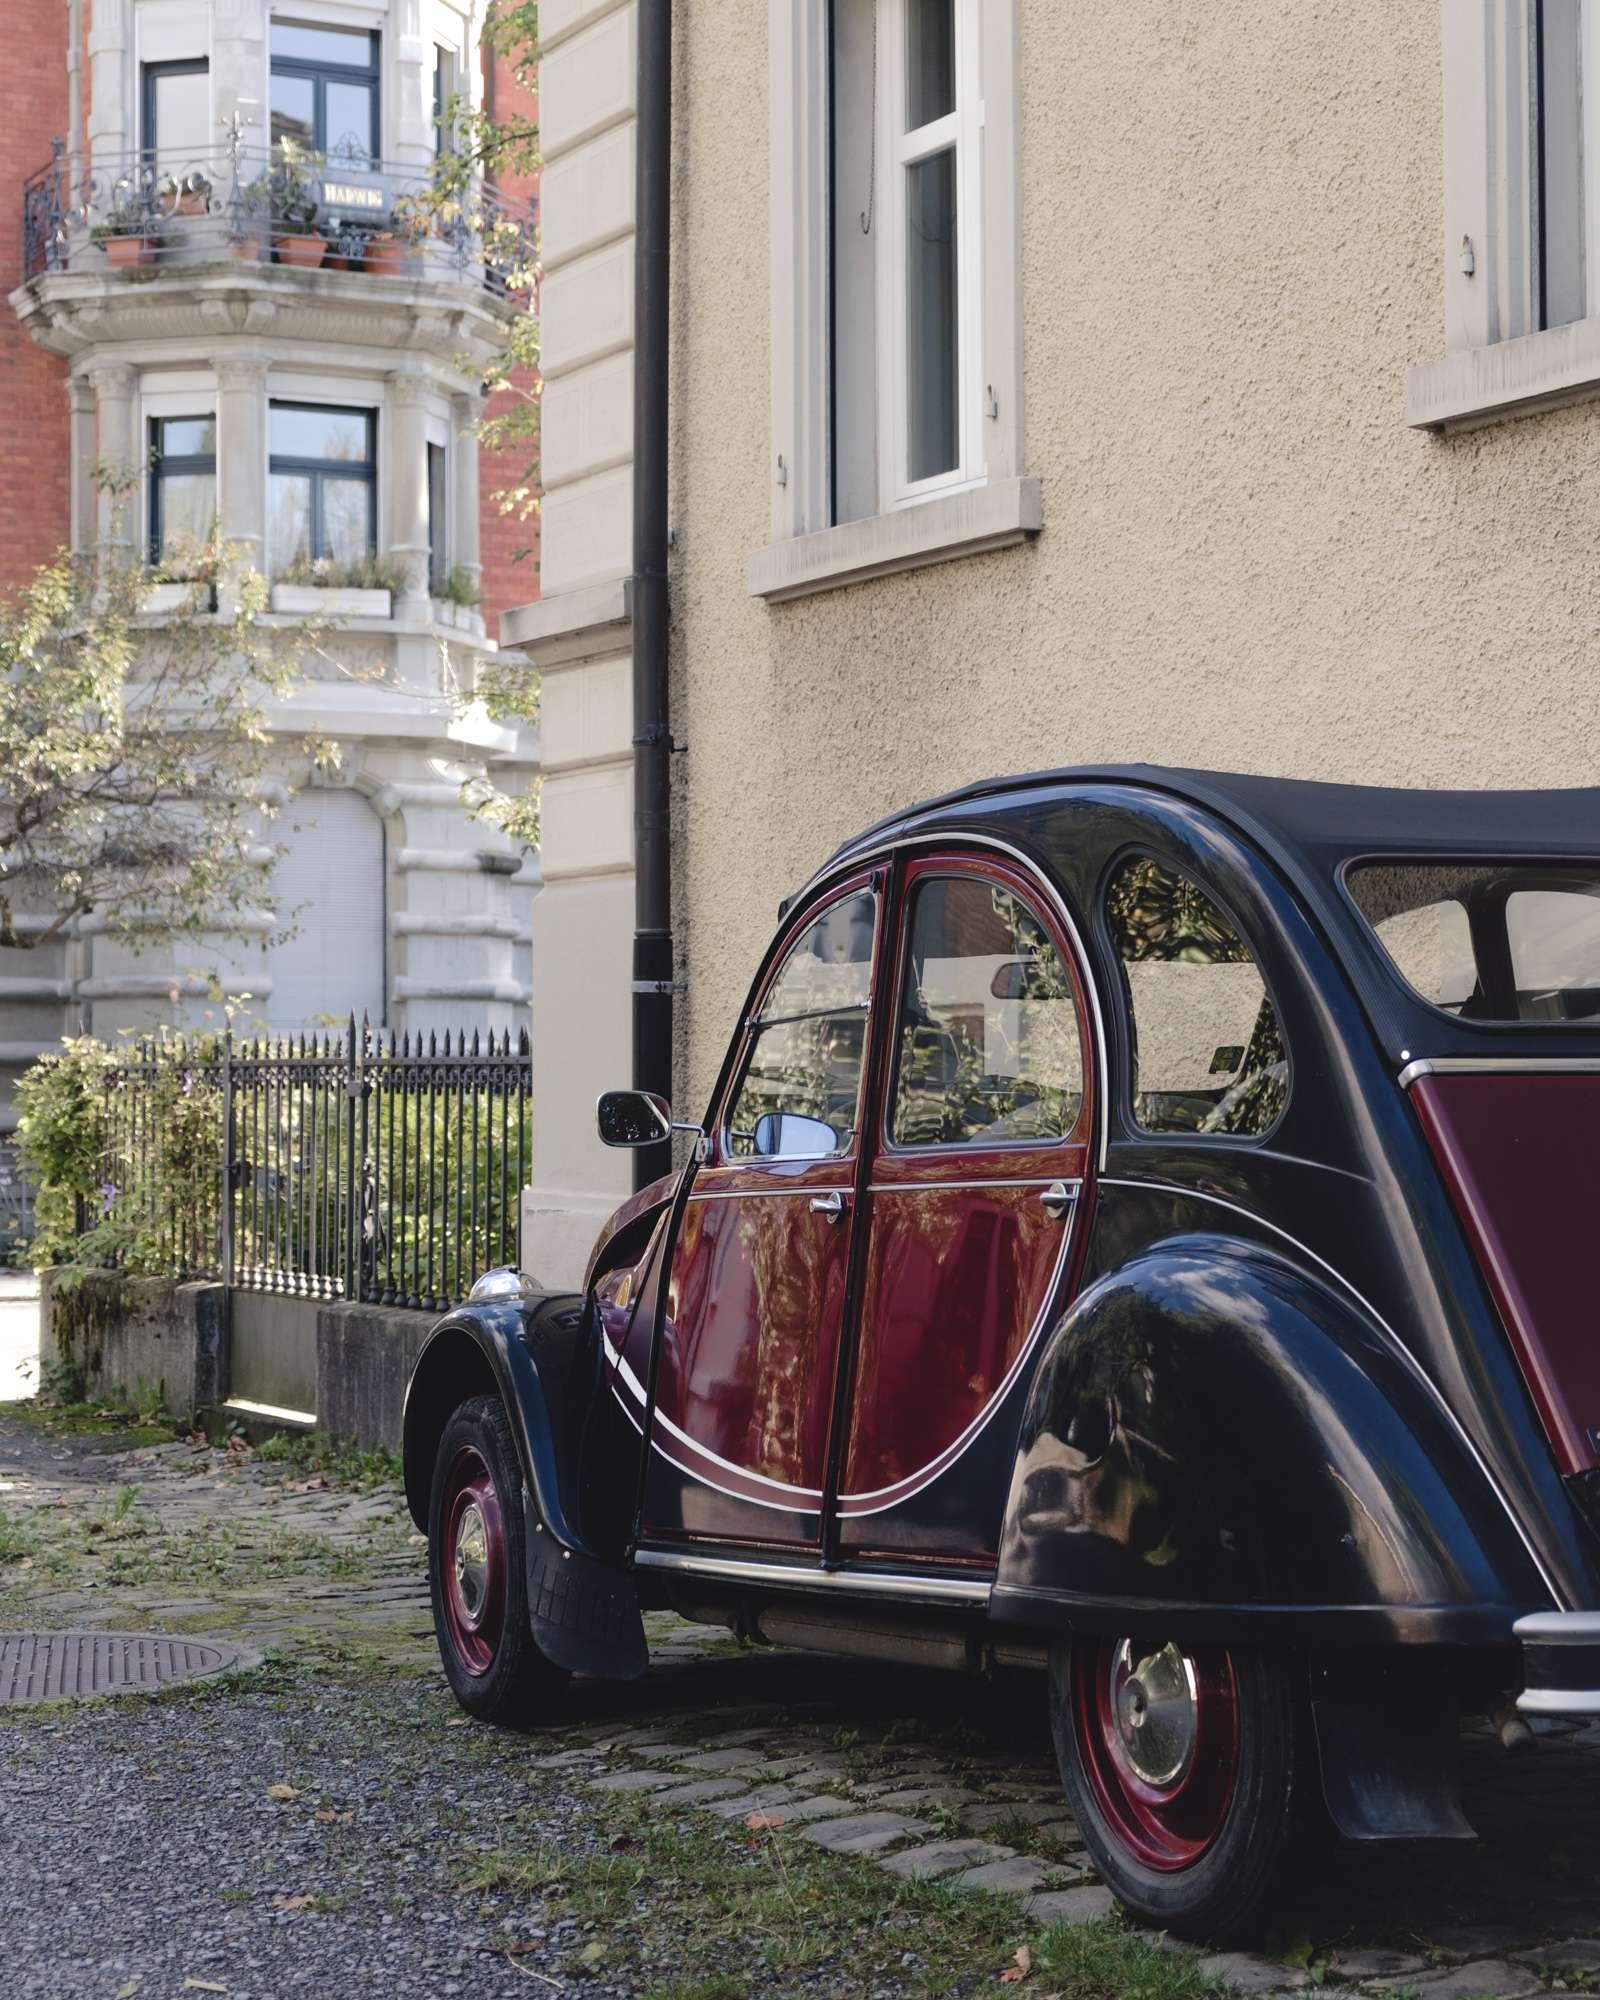 Red and black Käfer vintage car in St. Gallen